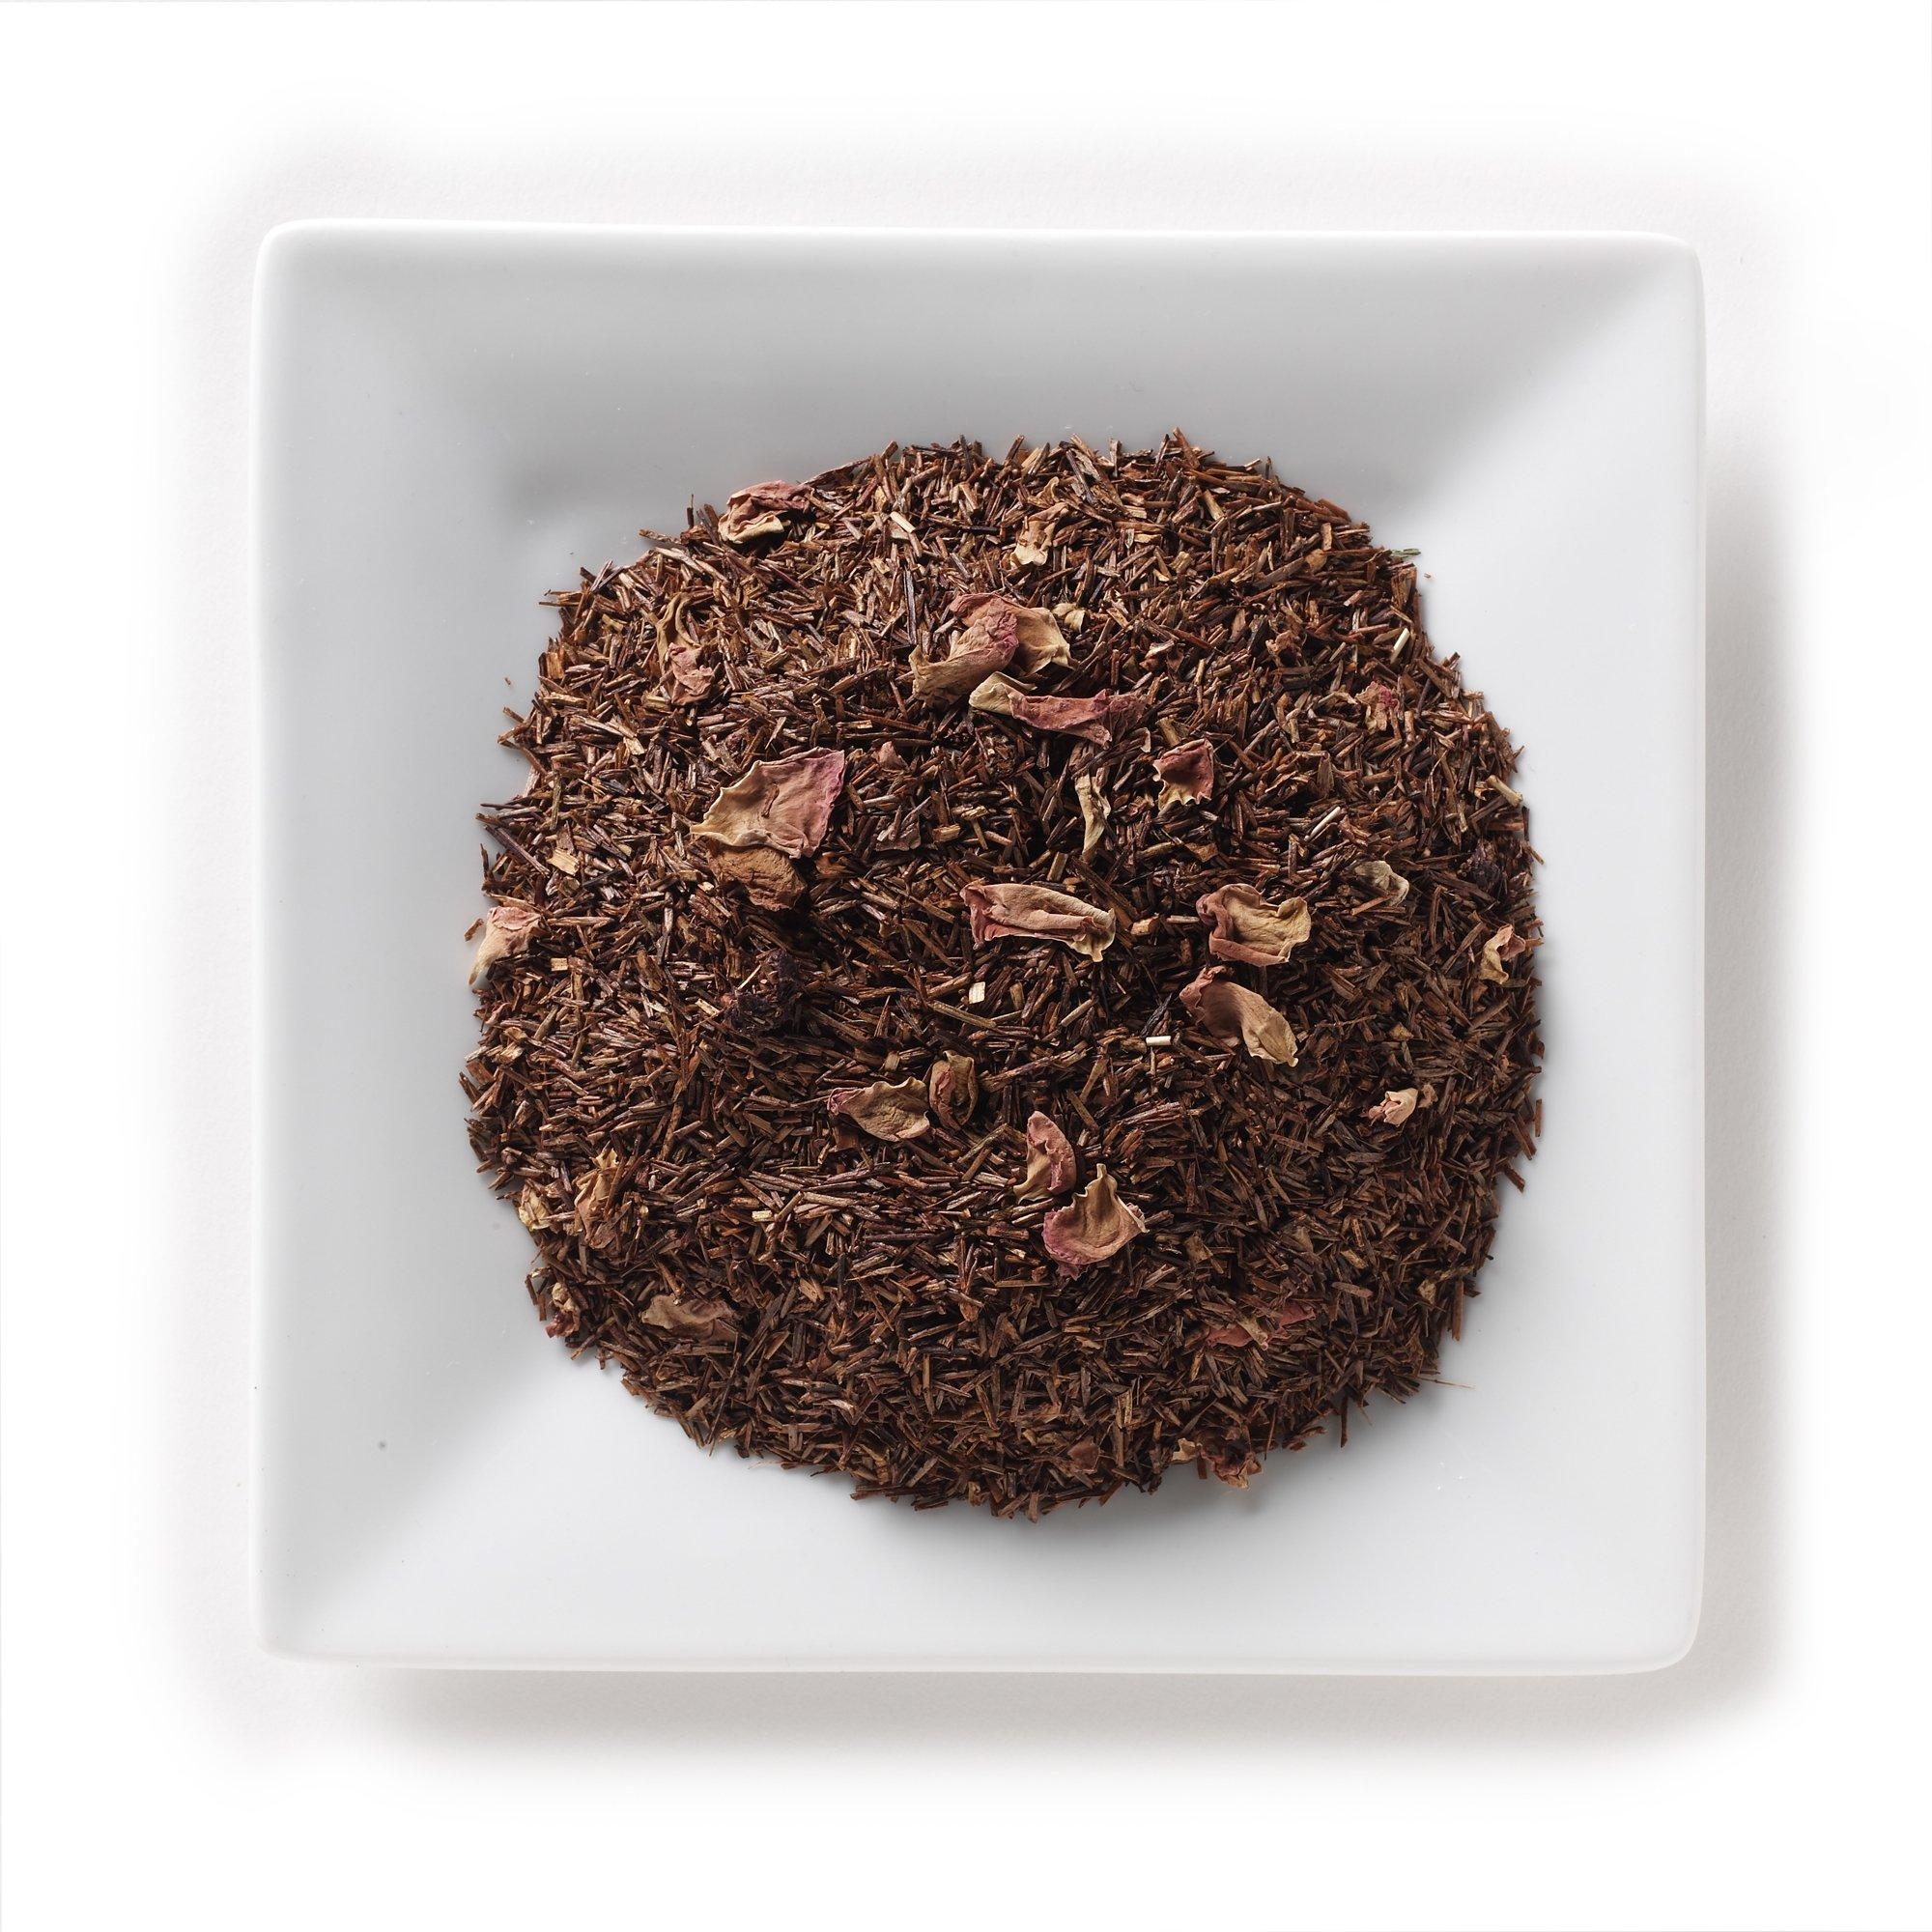 Mahamosa Raspberry Vanilla Rooibos Tea 8 oz - Loose Leaf Rooibos Herbal Tea Blend (with flavoring, freeze-dried whole raspberries, rose petals, vanilla pieces)